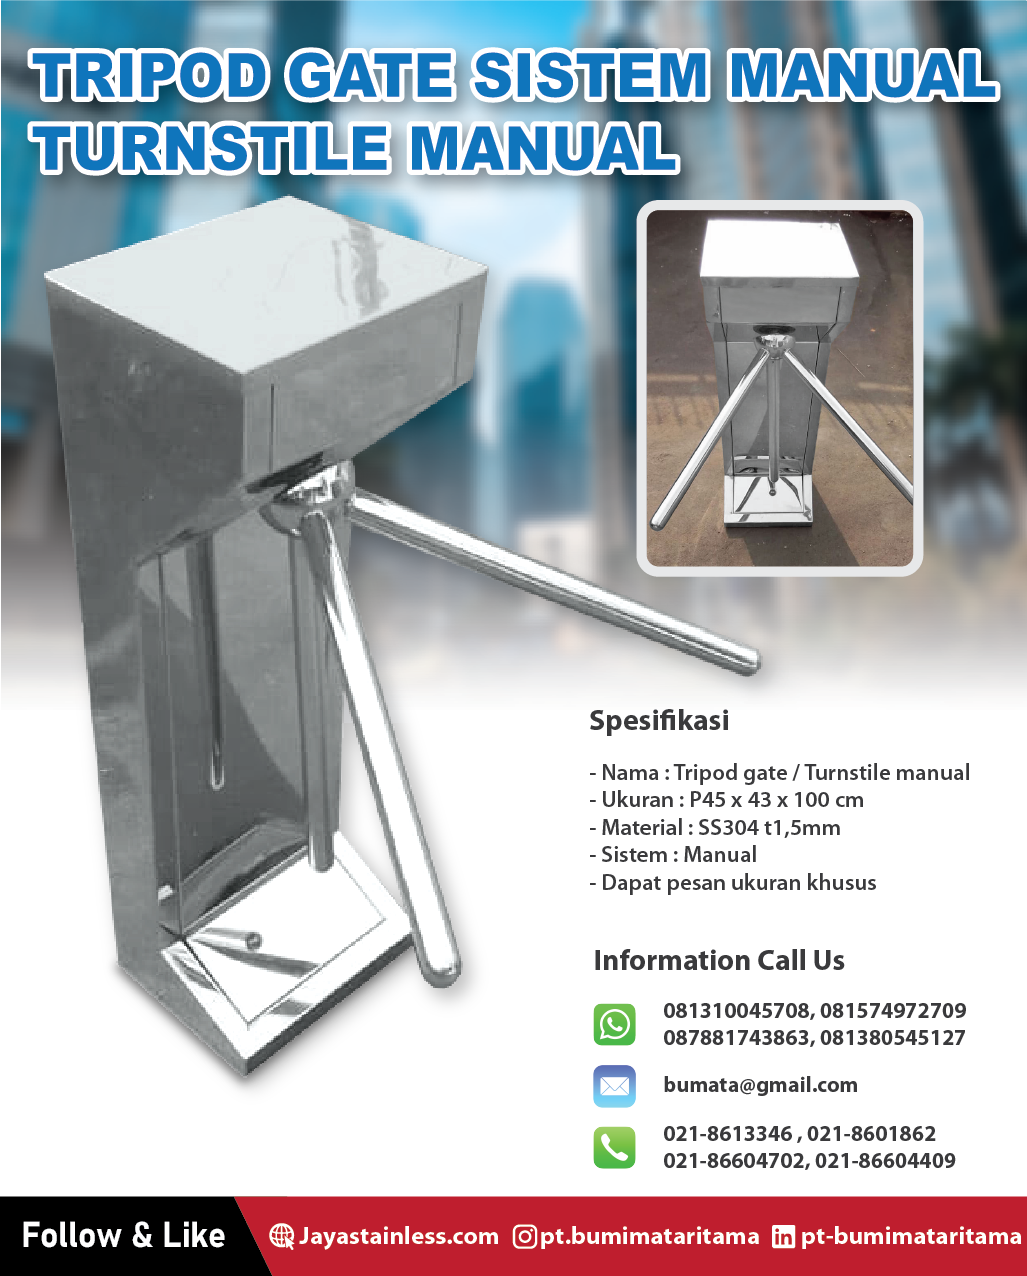 Tripod gate stainless sistem manual